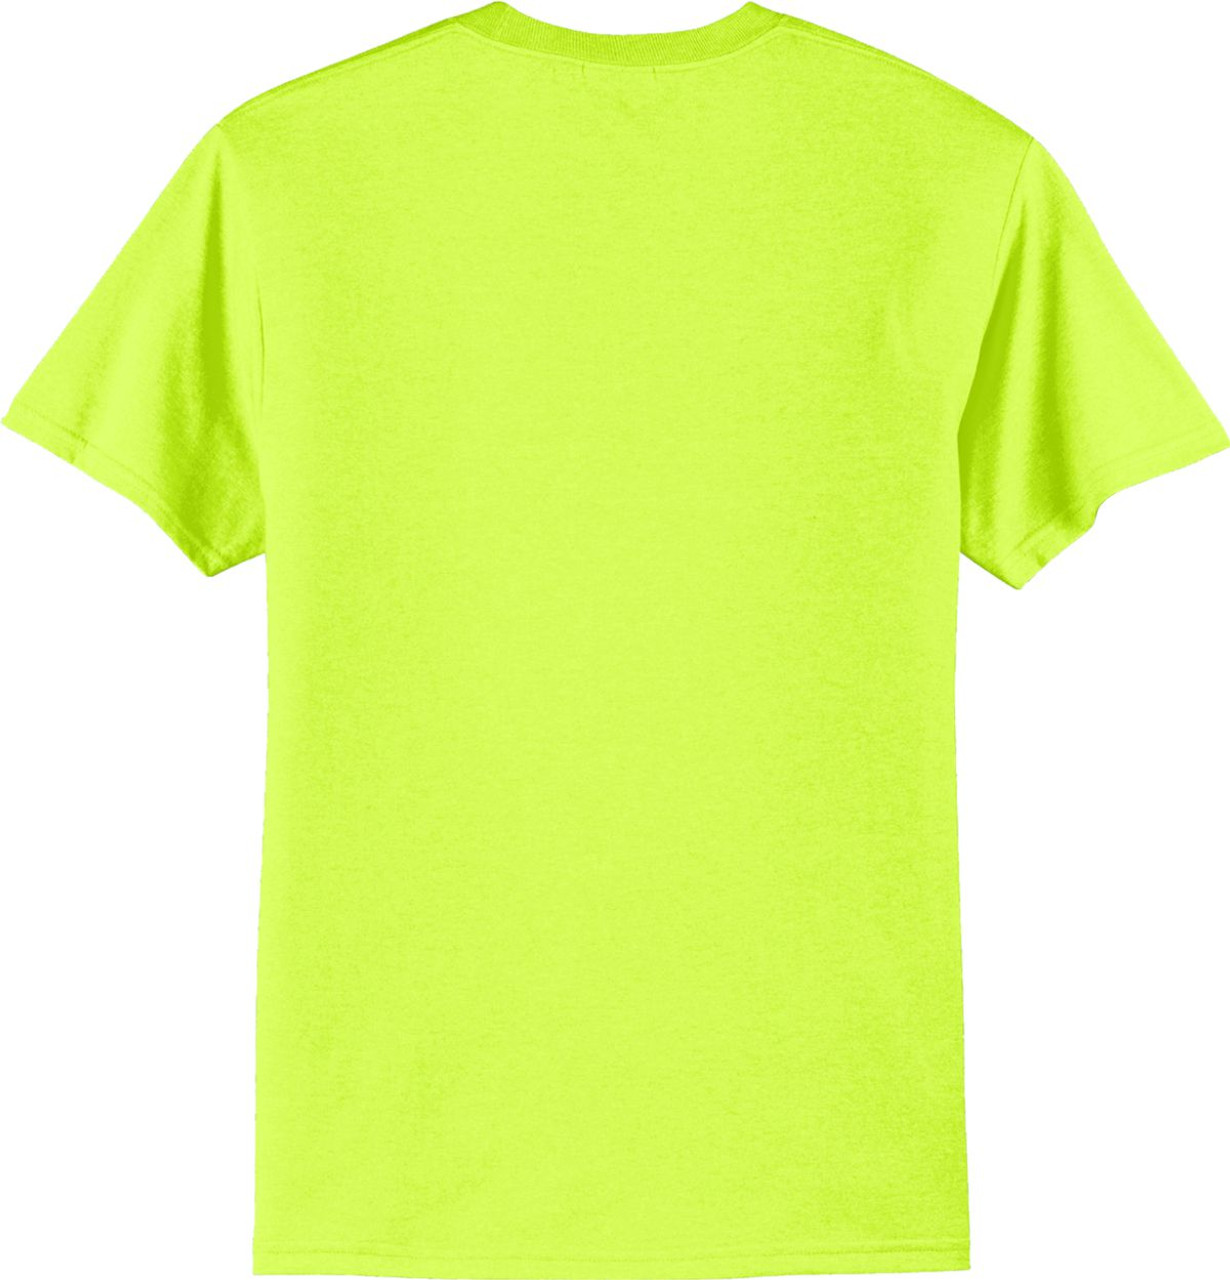 Safety Green Short Sleeve Pocket T Shirt Back